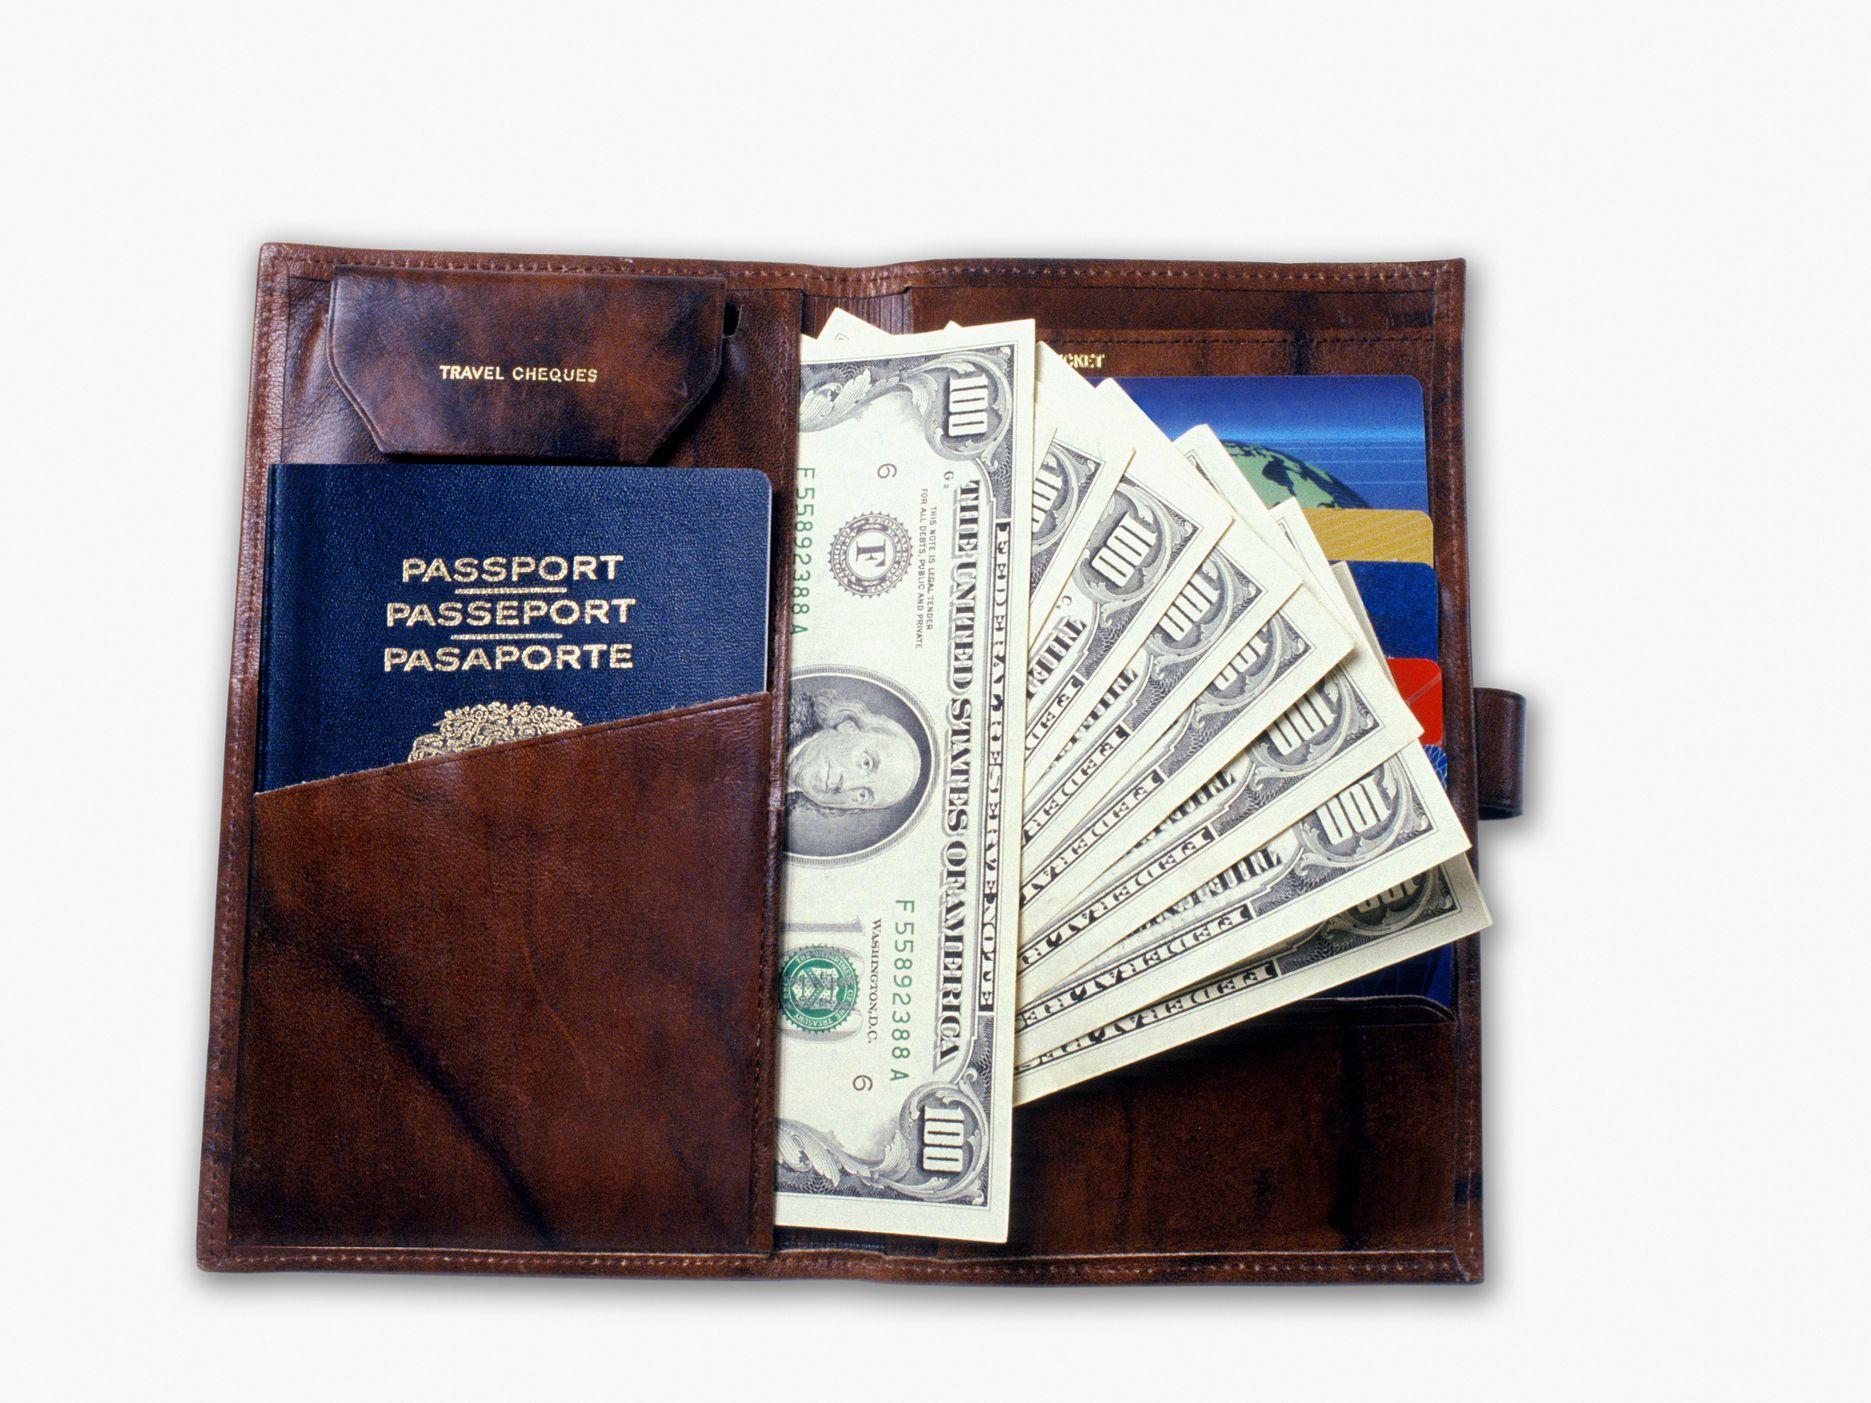 d356127b62ba The 10 Best Passport Holders of 2019